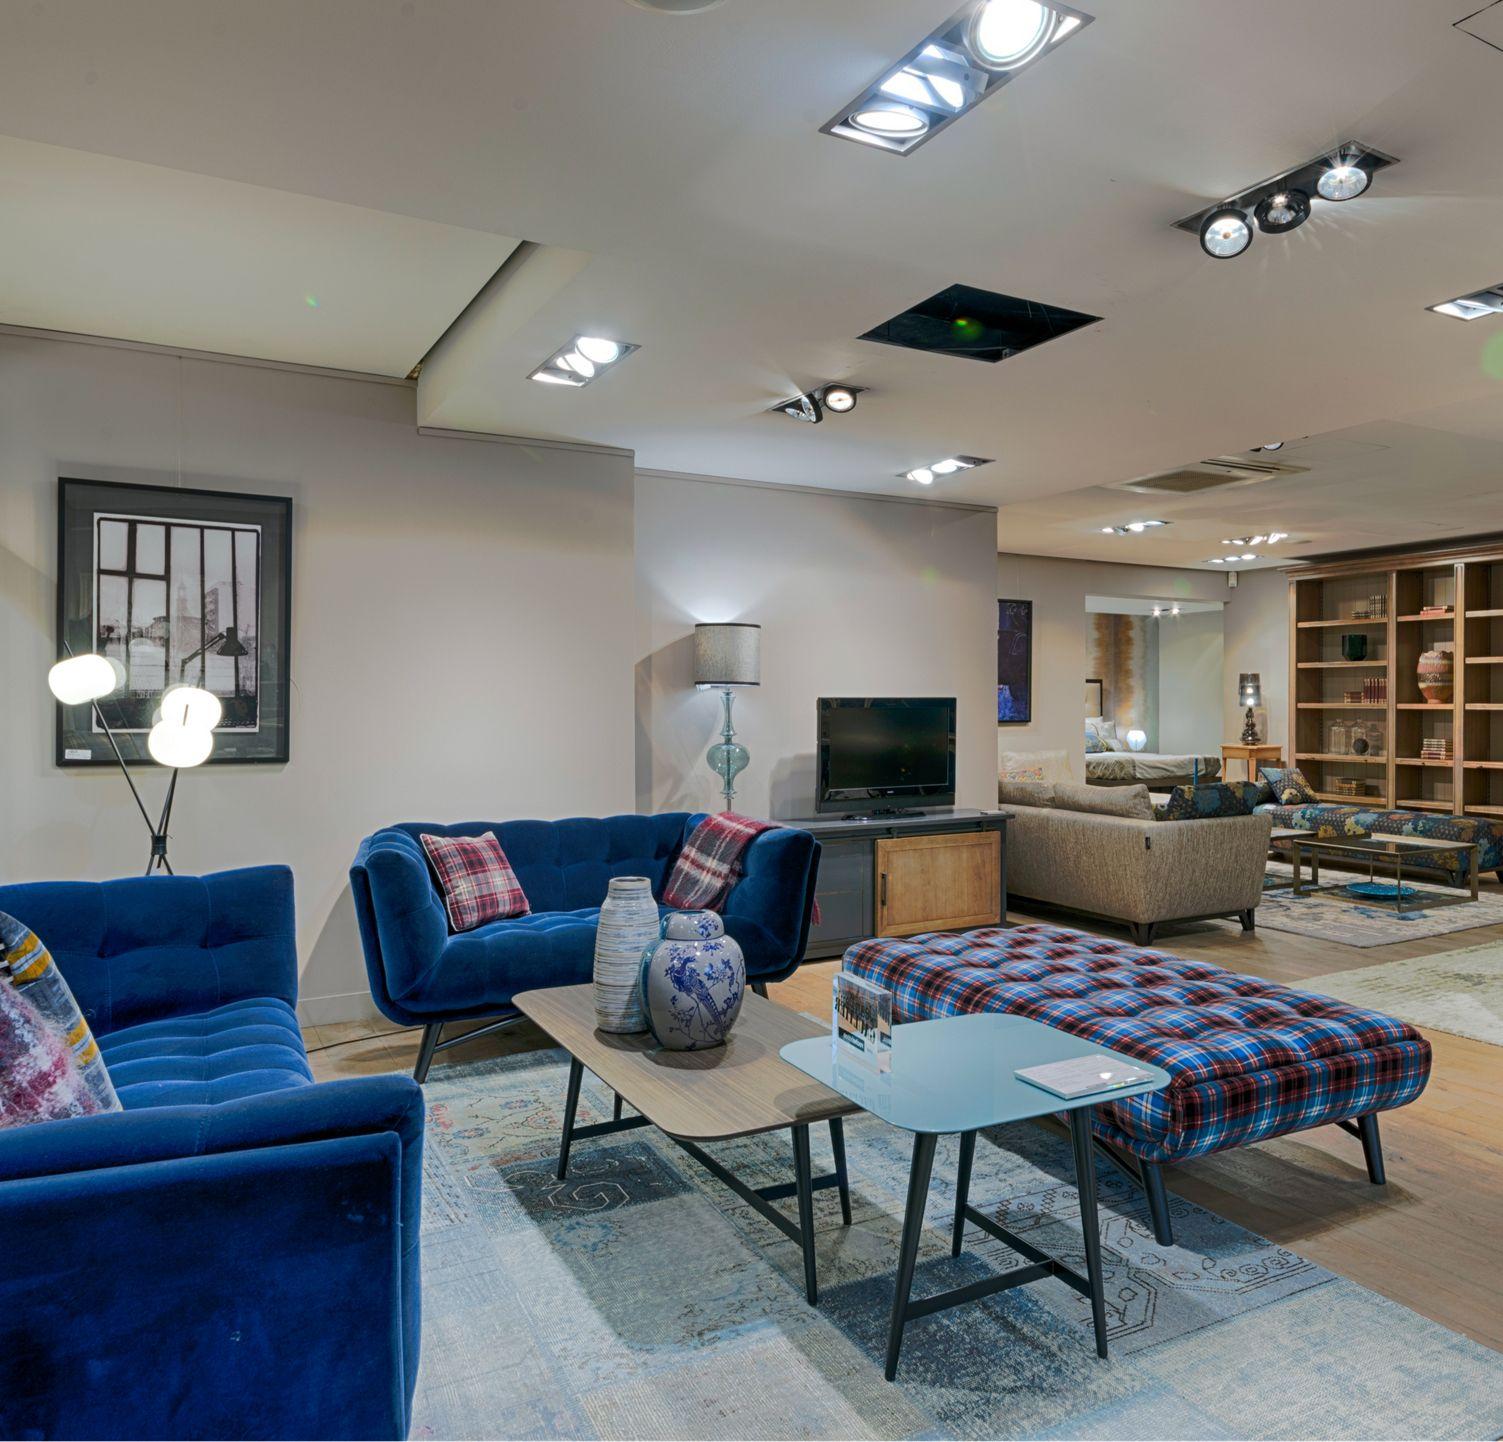 magasin roche bobois athis mons 91200. Black Bedroom Furniture Sets. Home Design Ideas